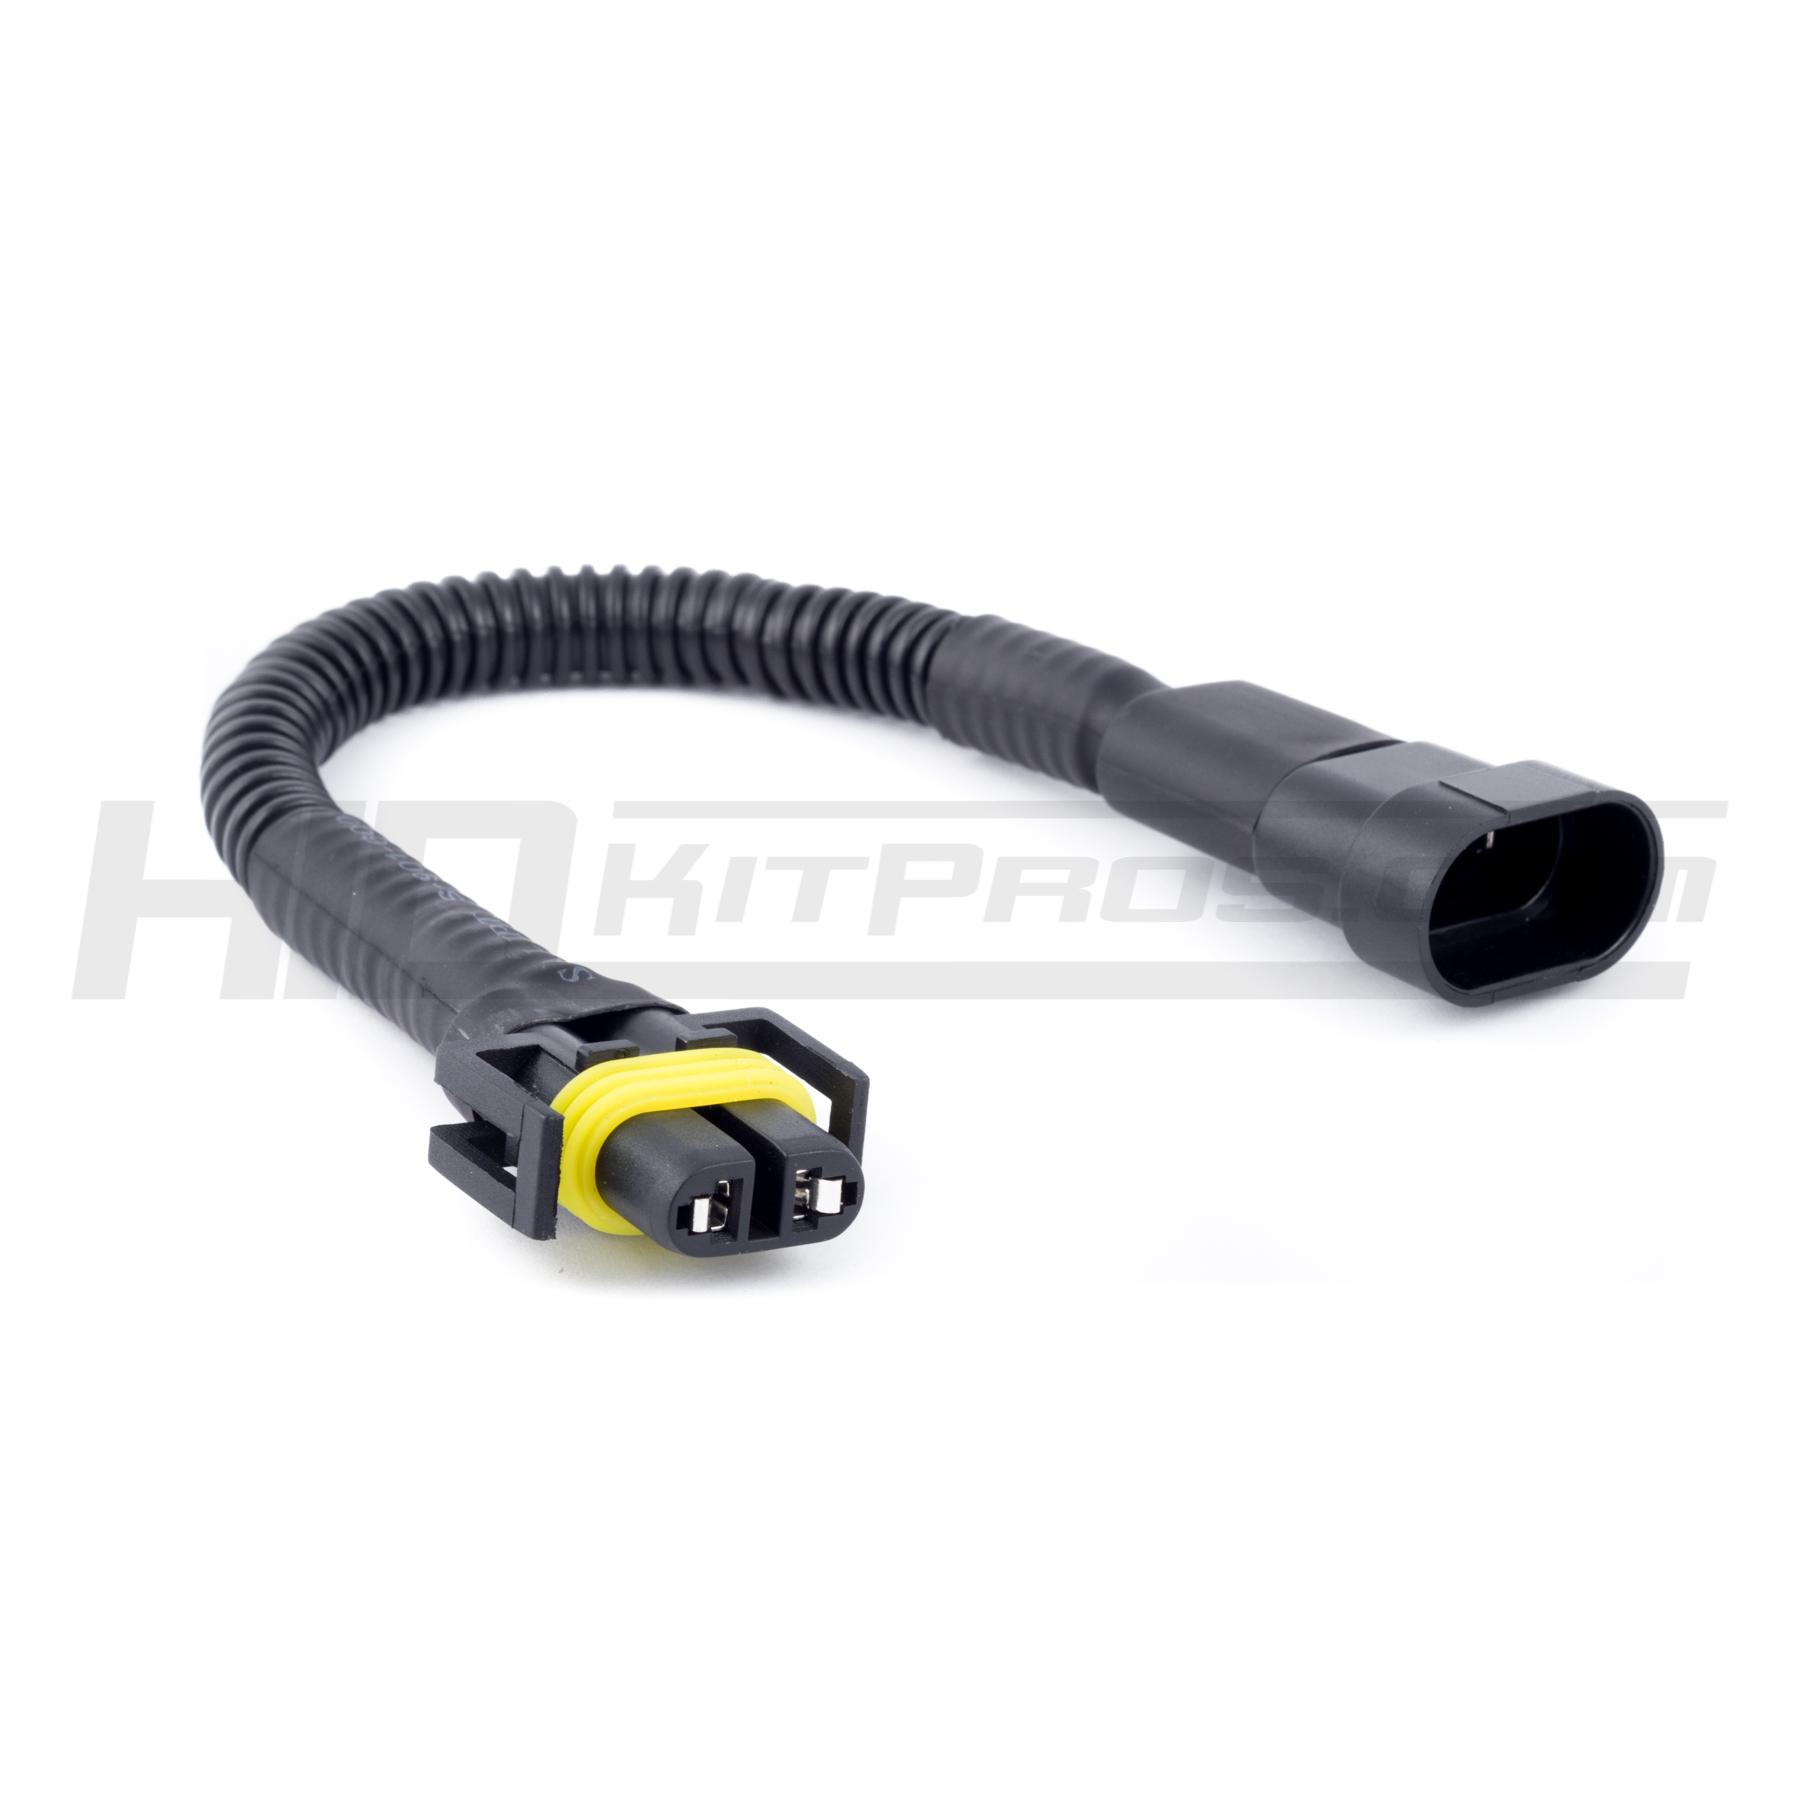 H11 Female To 9005 9006 H10 Male Converter Socket